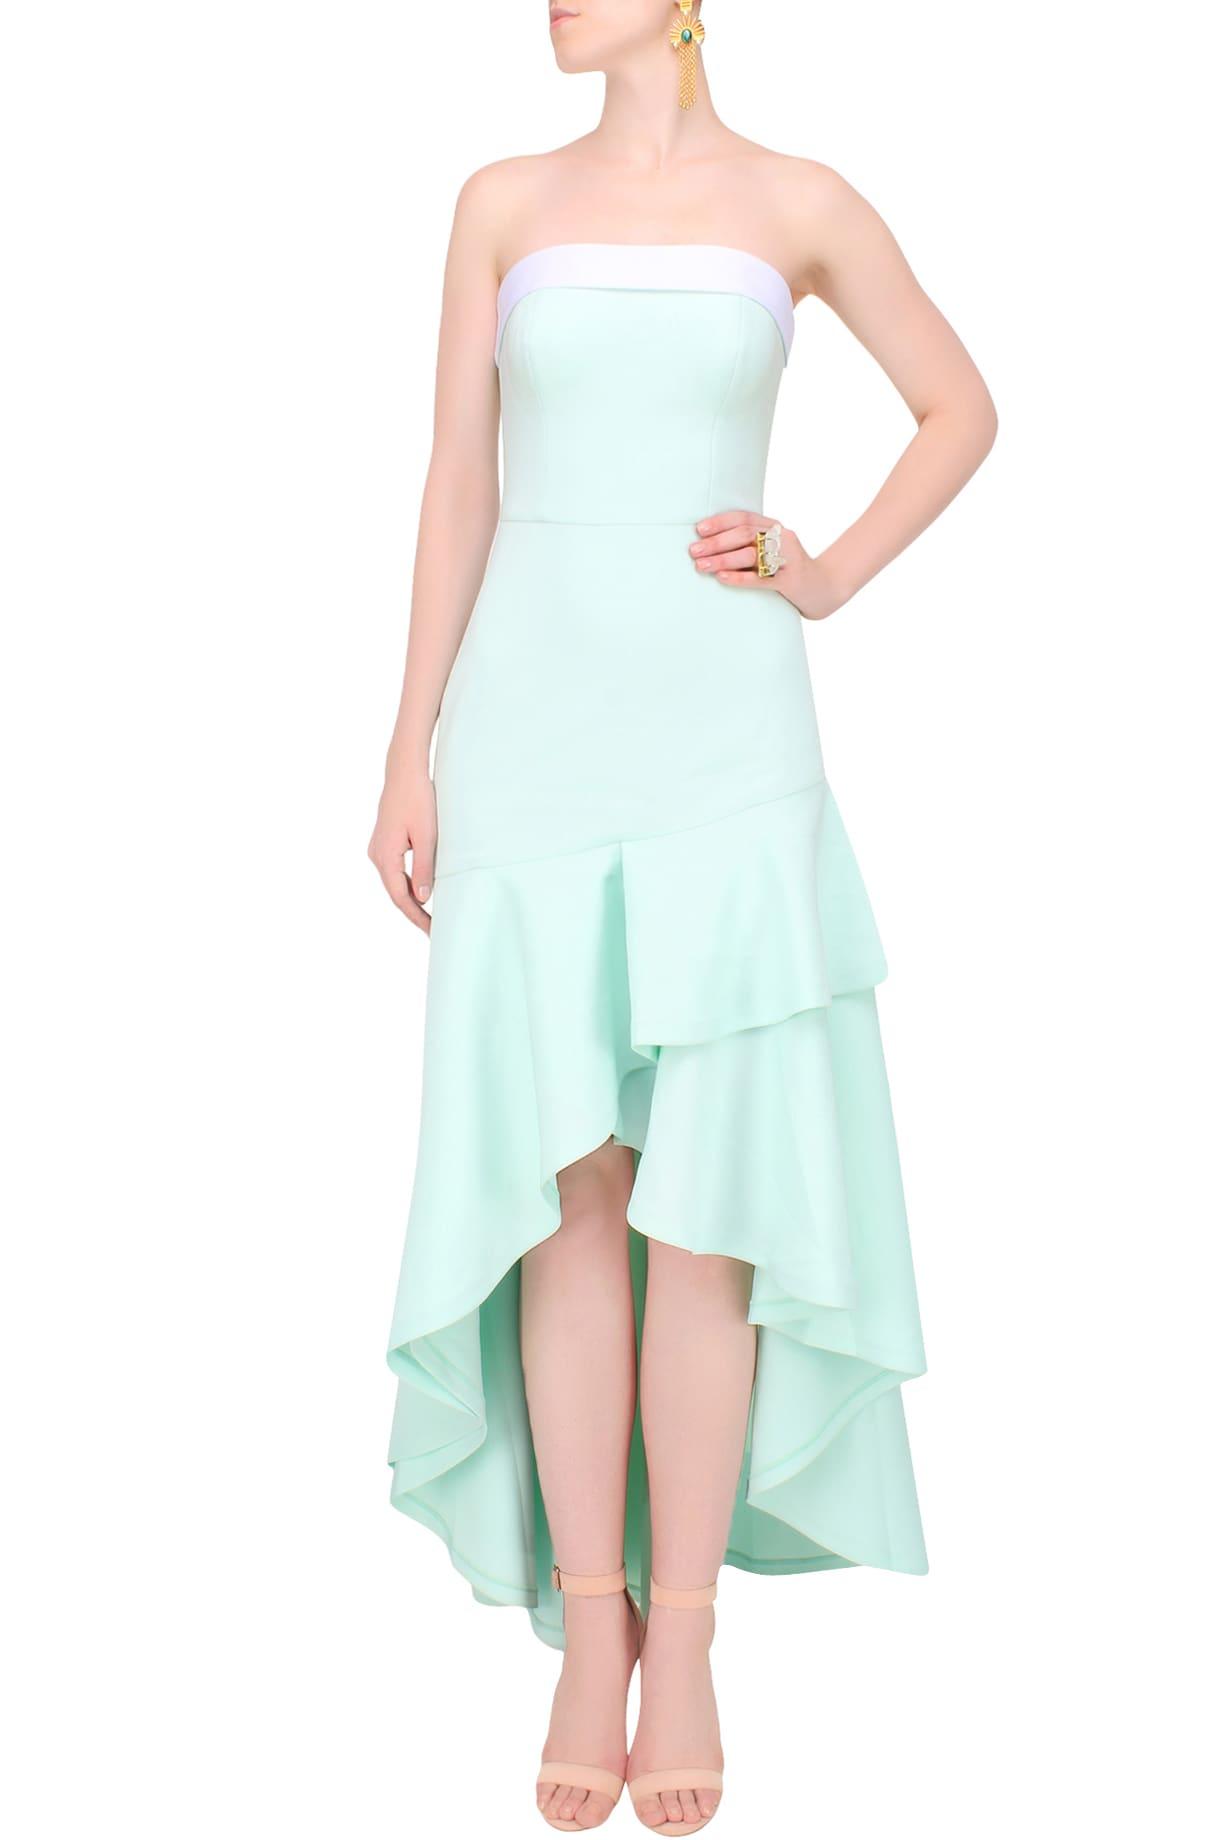 Shivani Awasty Gowns